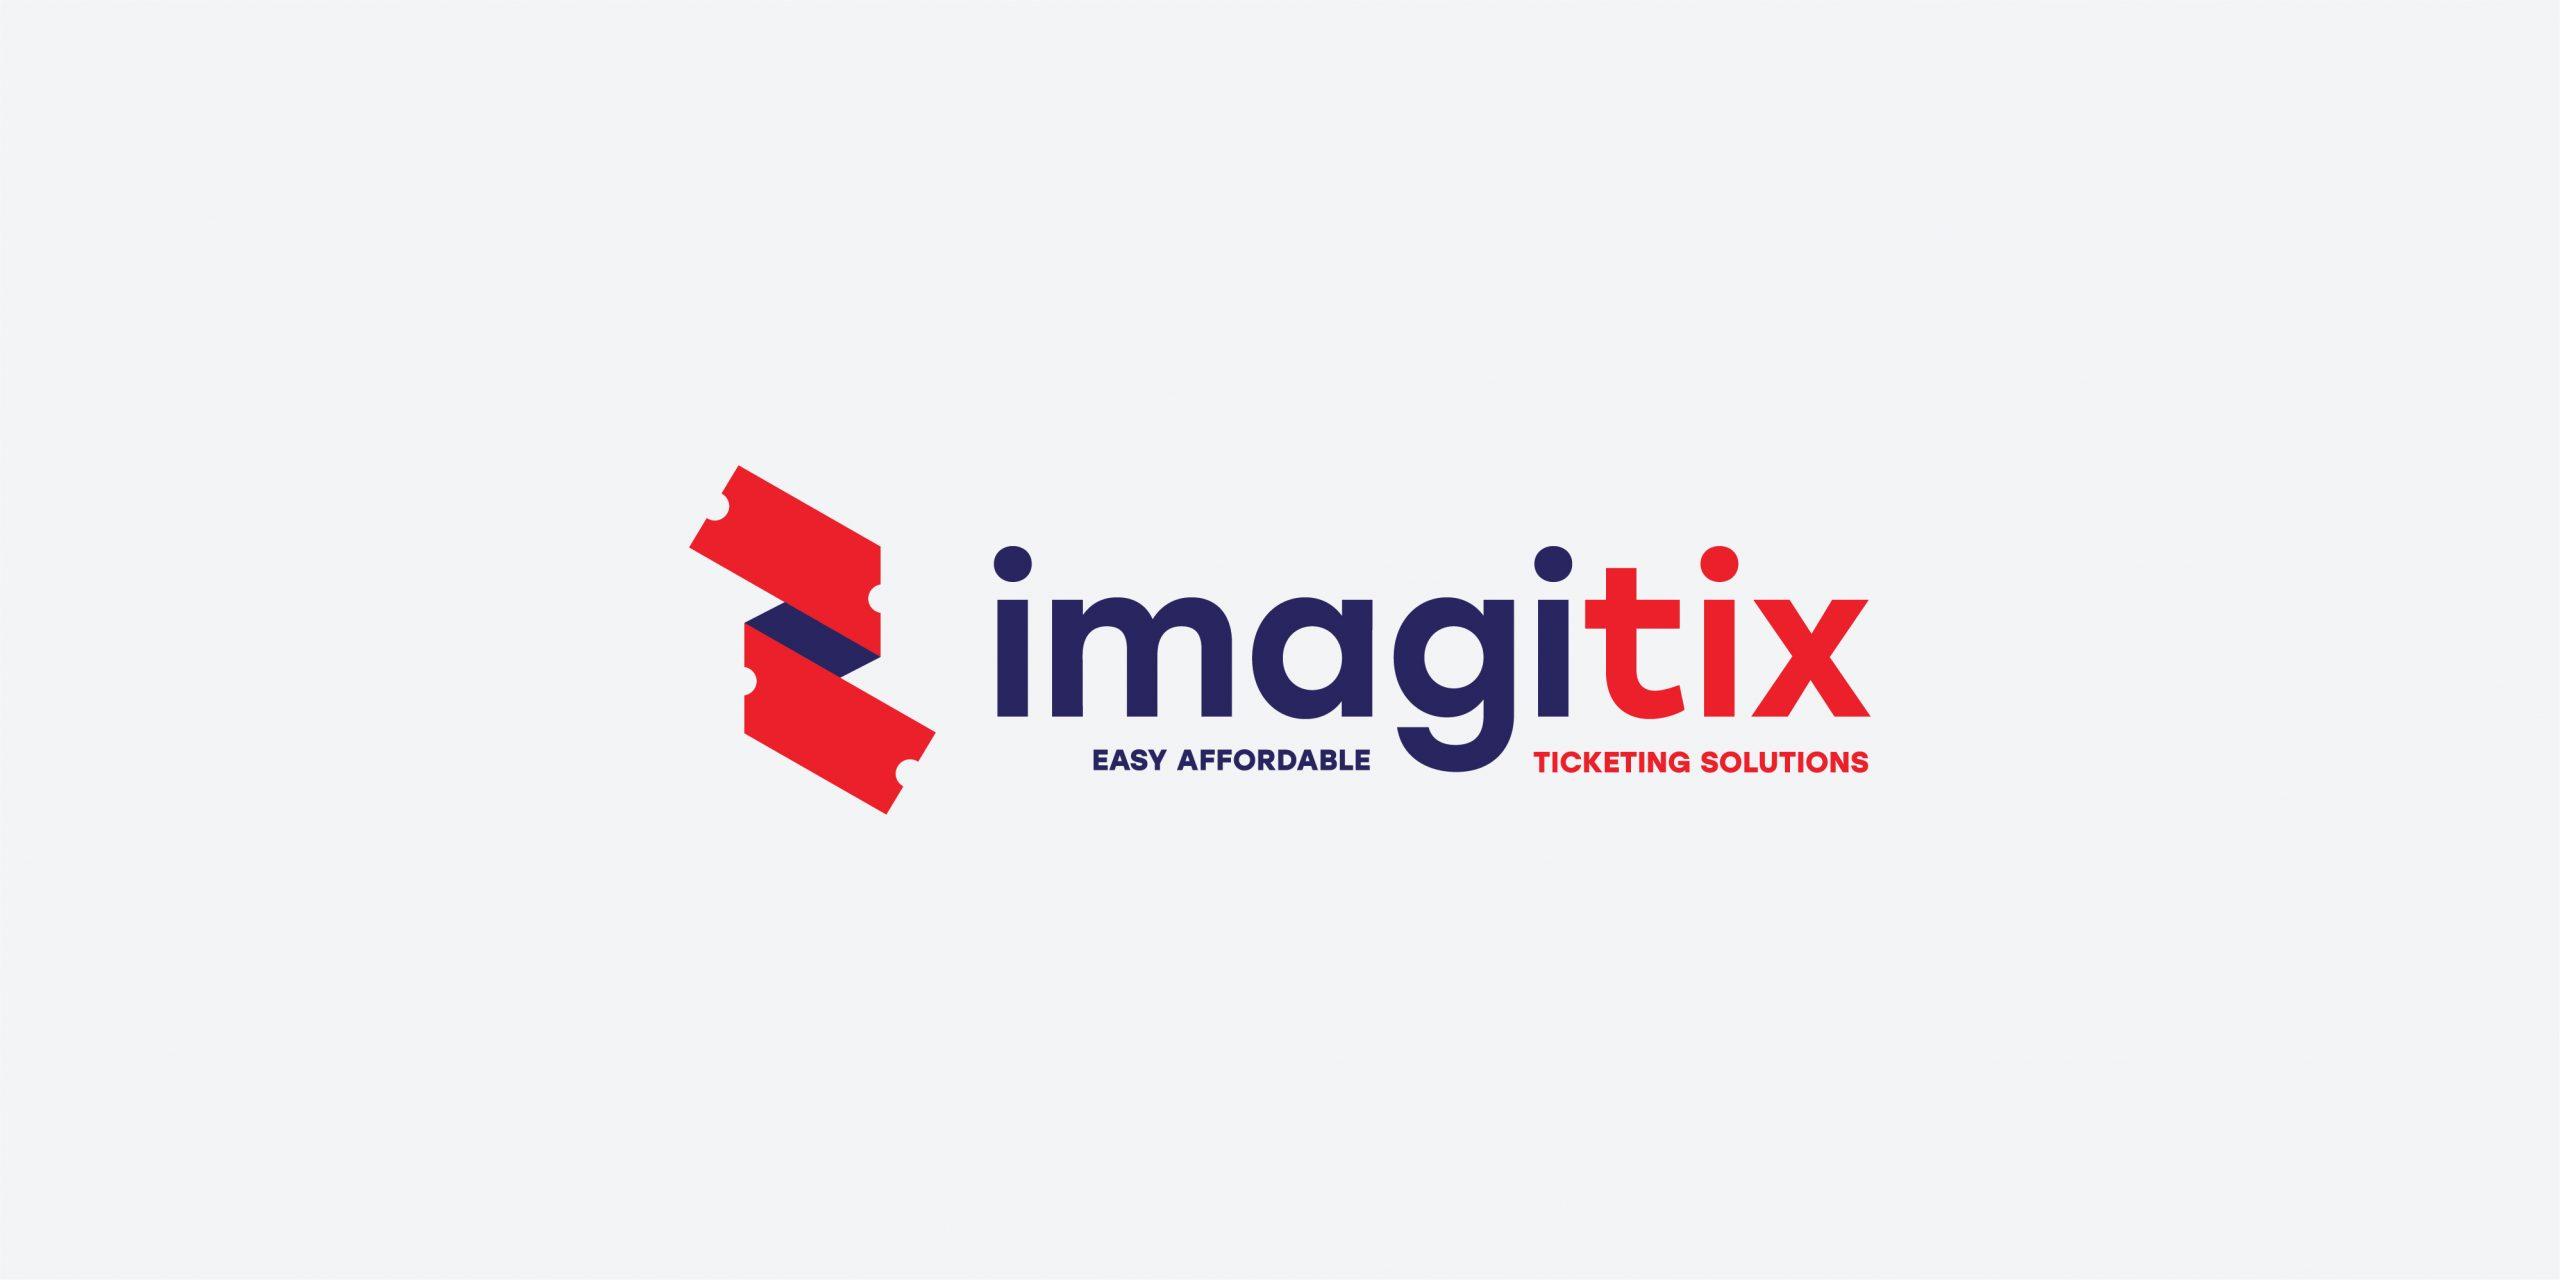 Imagitix_Tagline